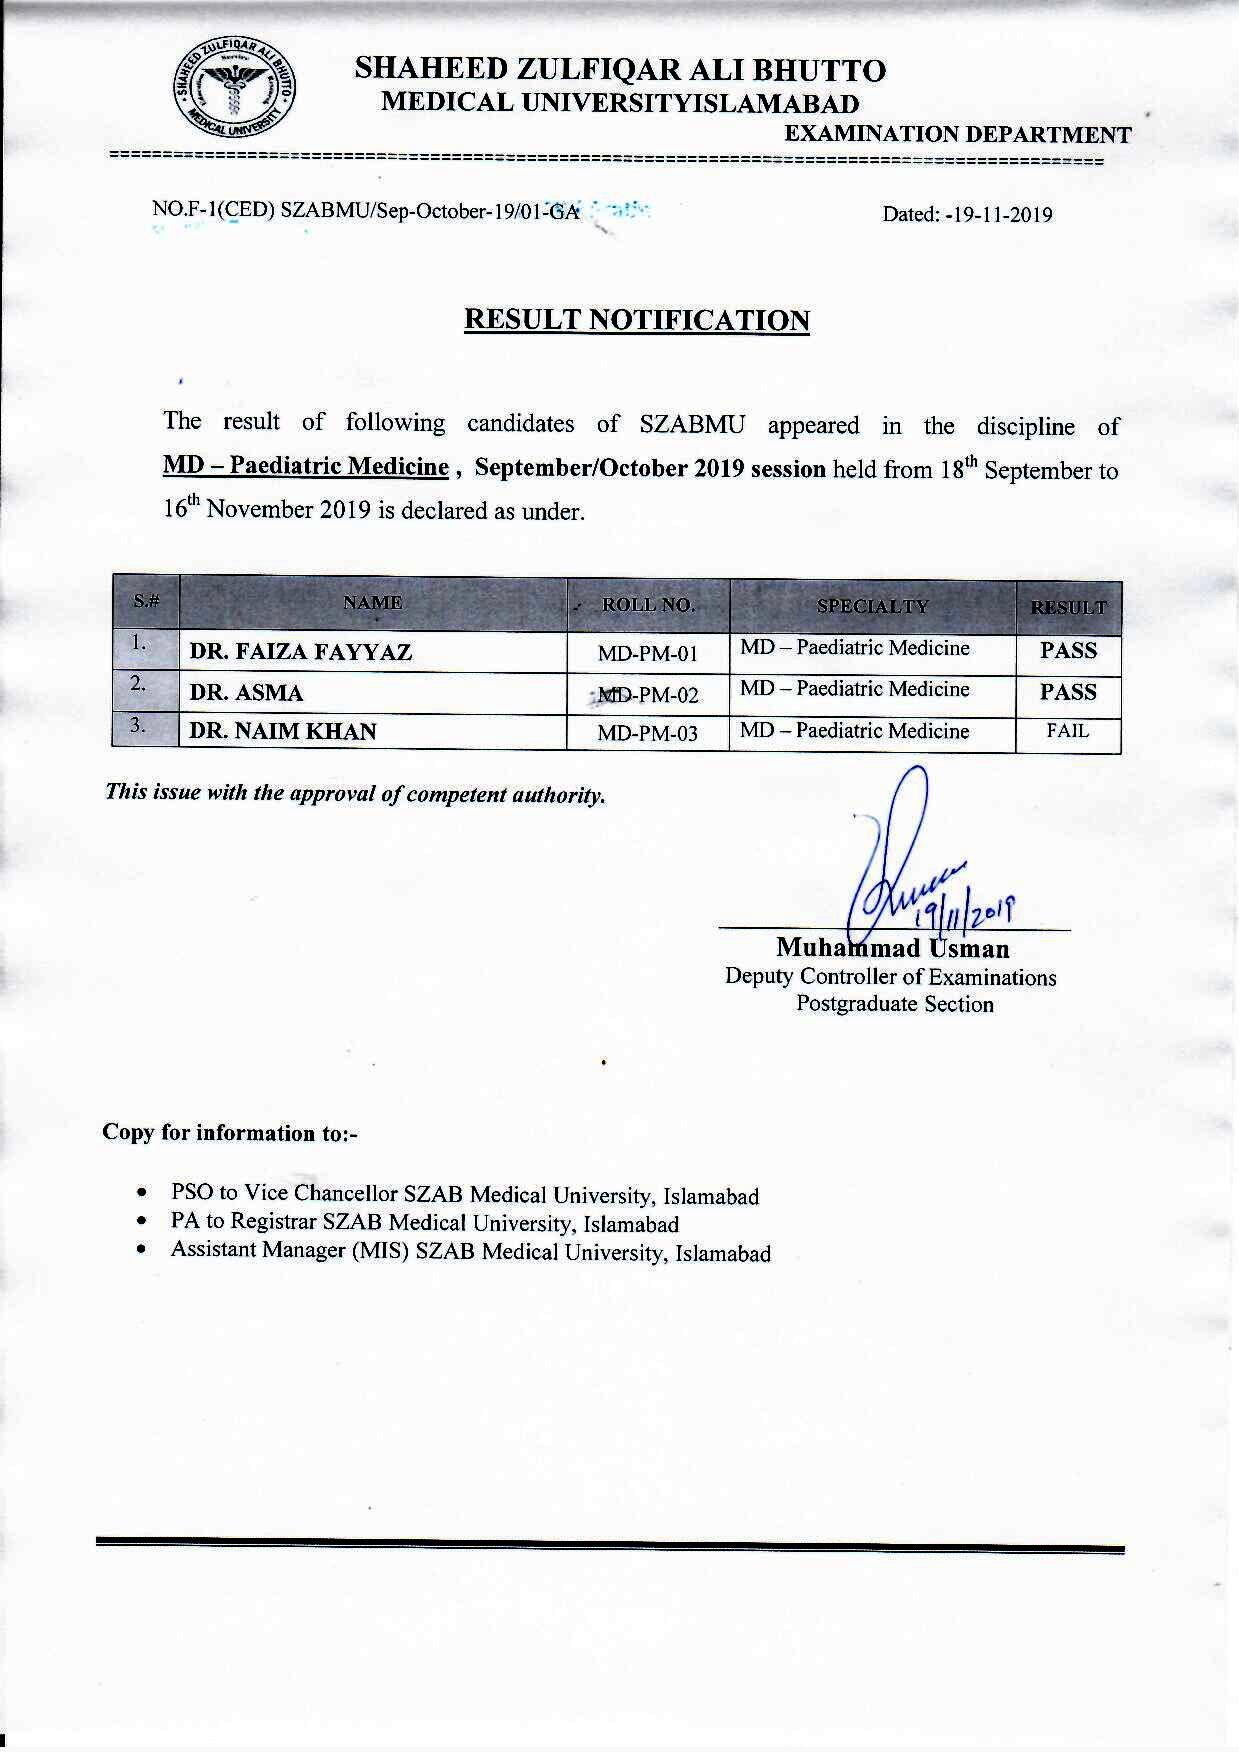 Result Notification - MD (Paediatric Medicine)